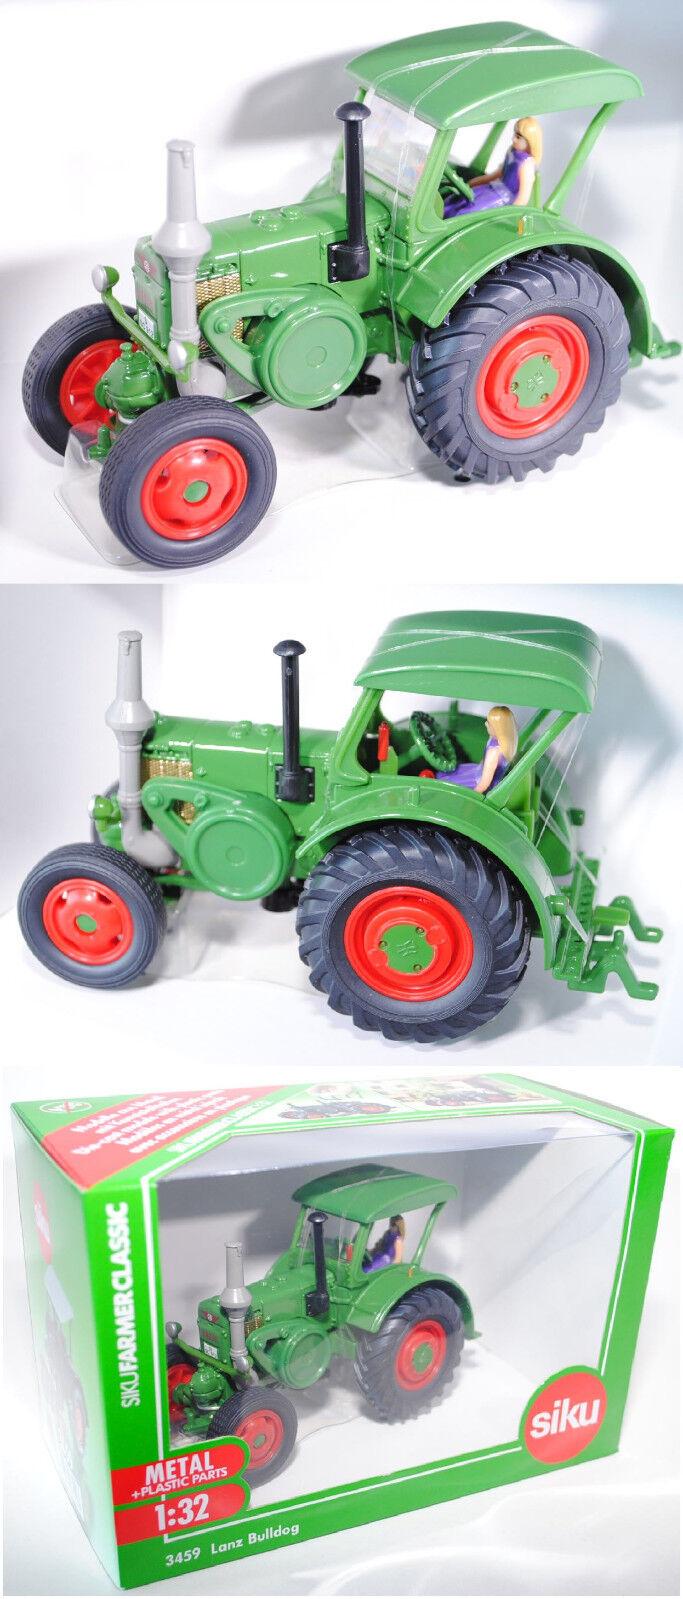 SIKU FARMER Classic 3459 URSUS, SSC Spécial Modèle 2012, 1 32